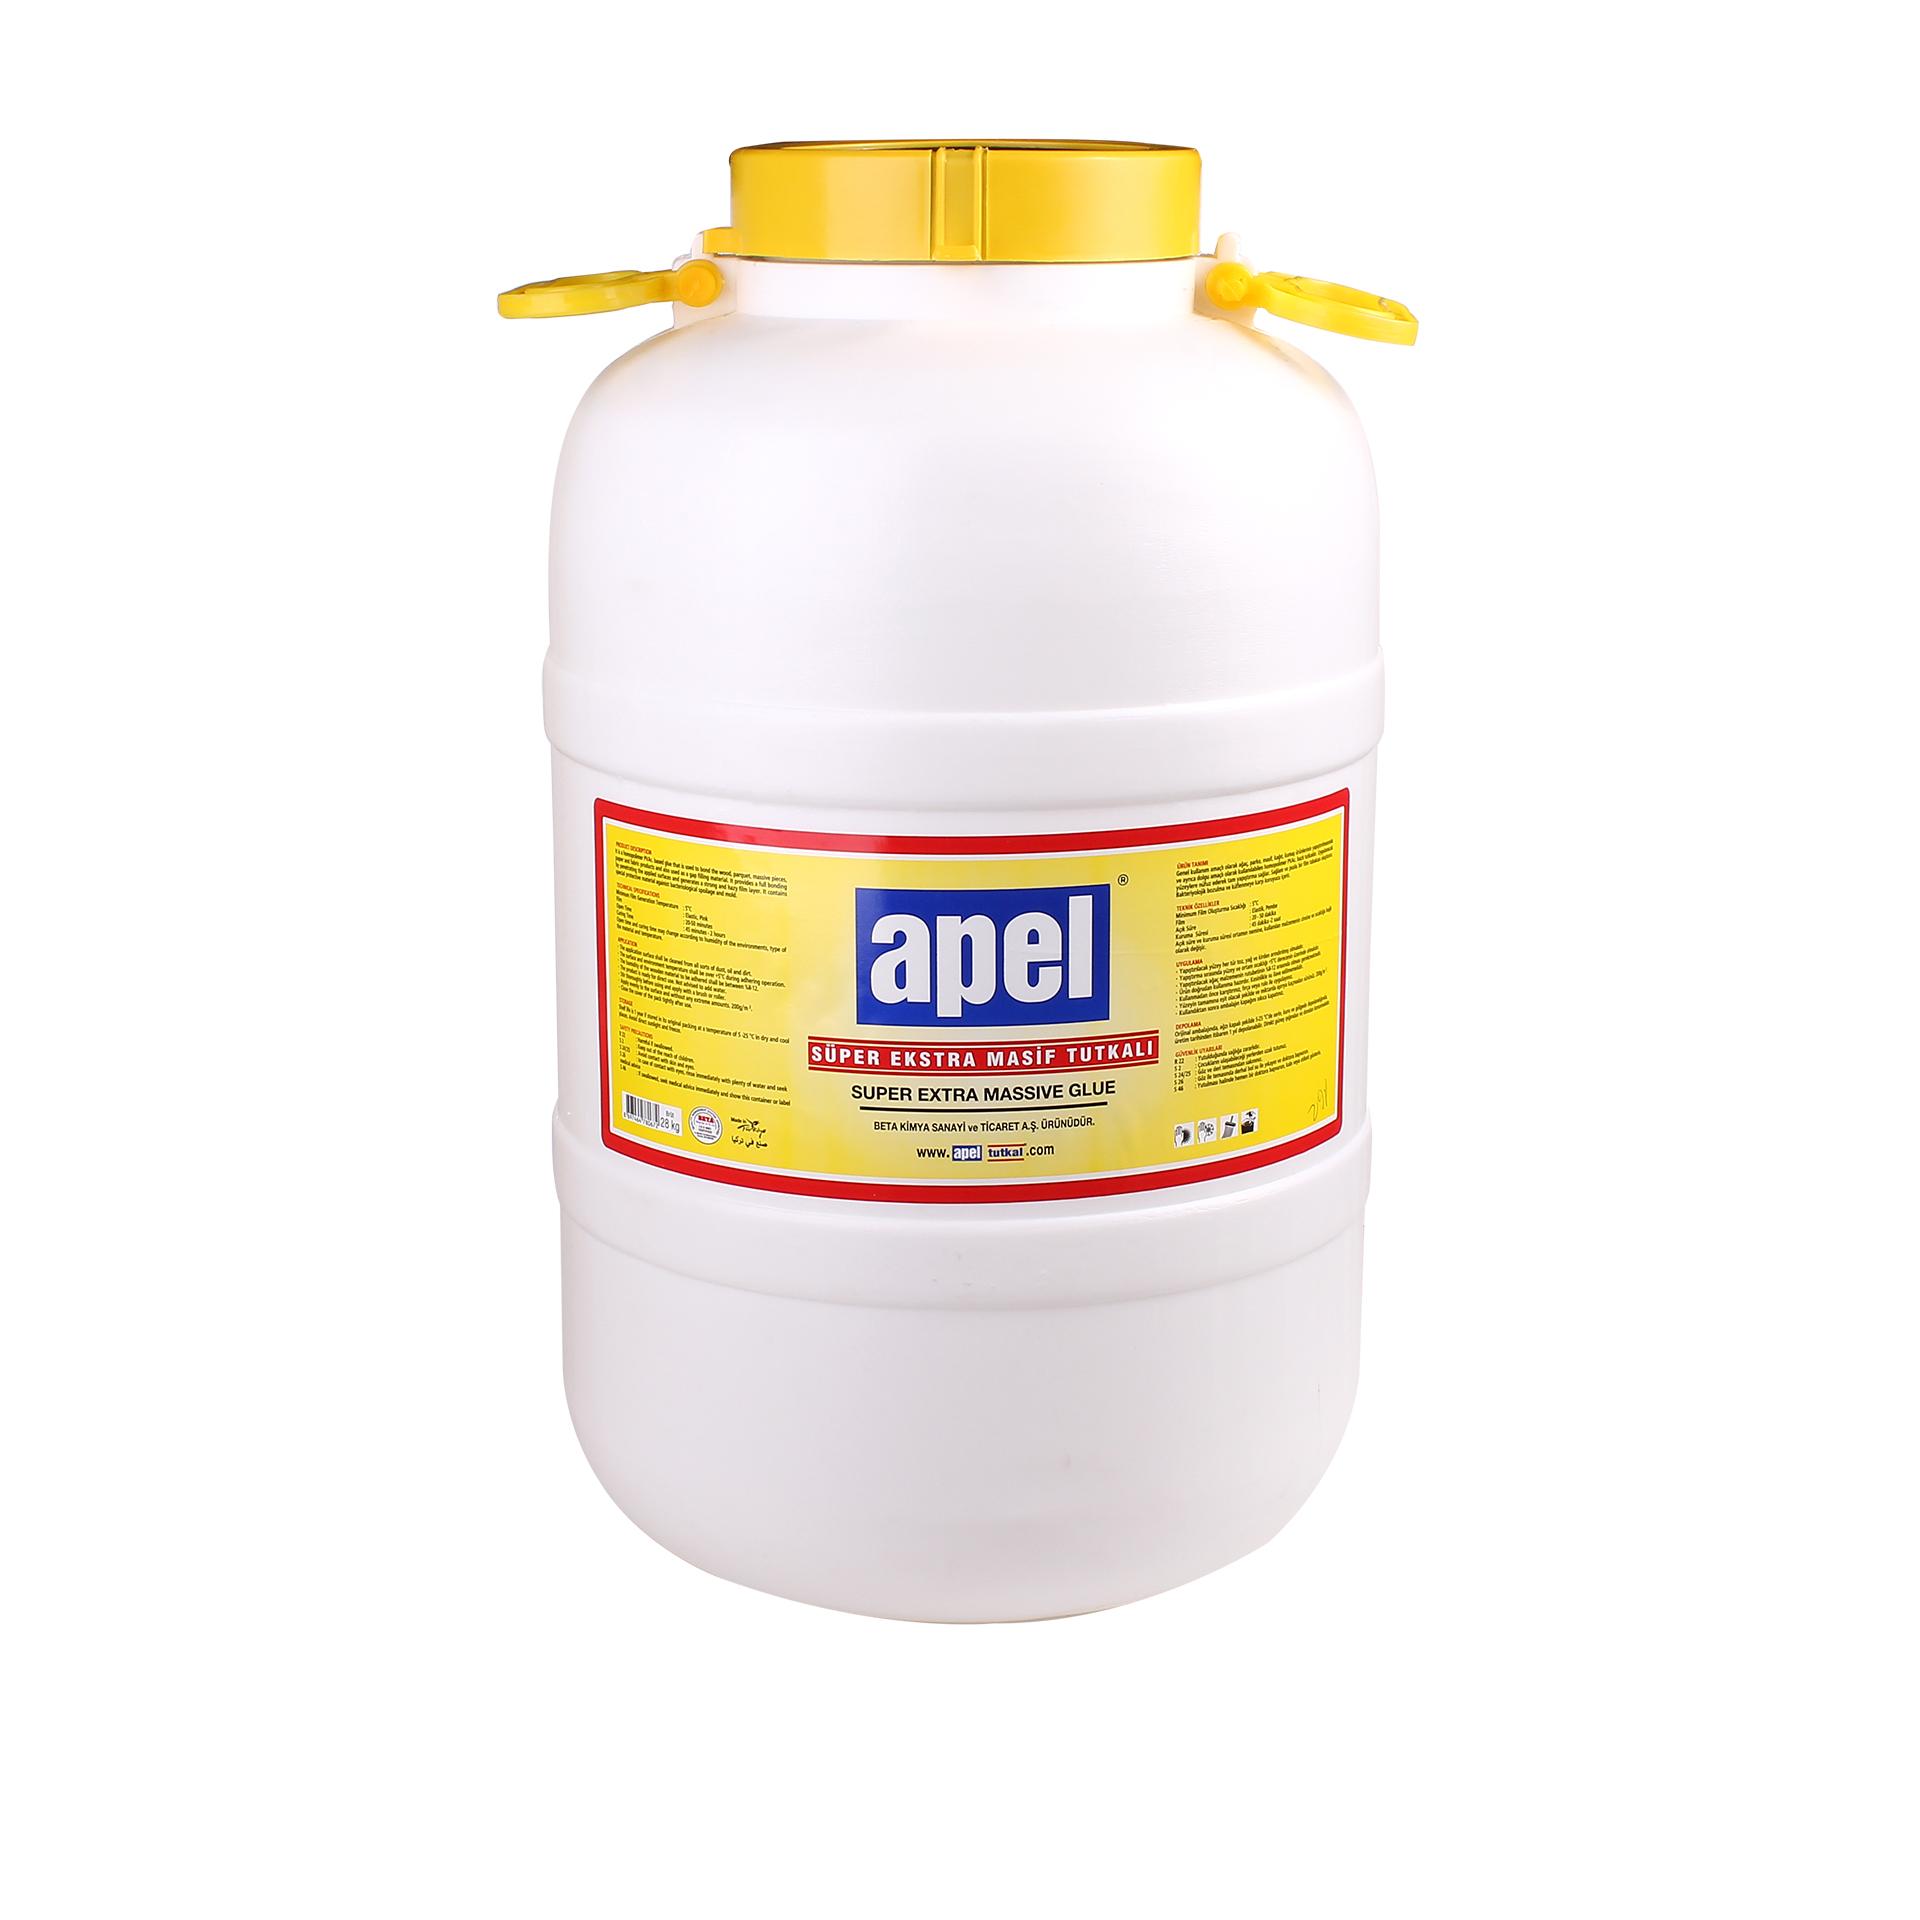 APEL Super Extra White - Massive Glue_2